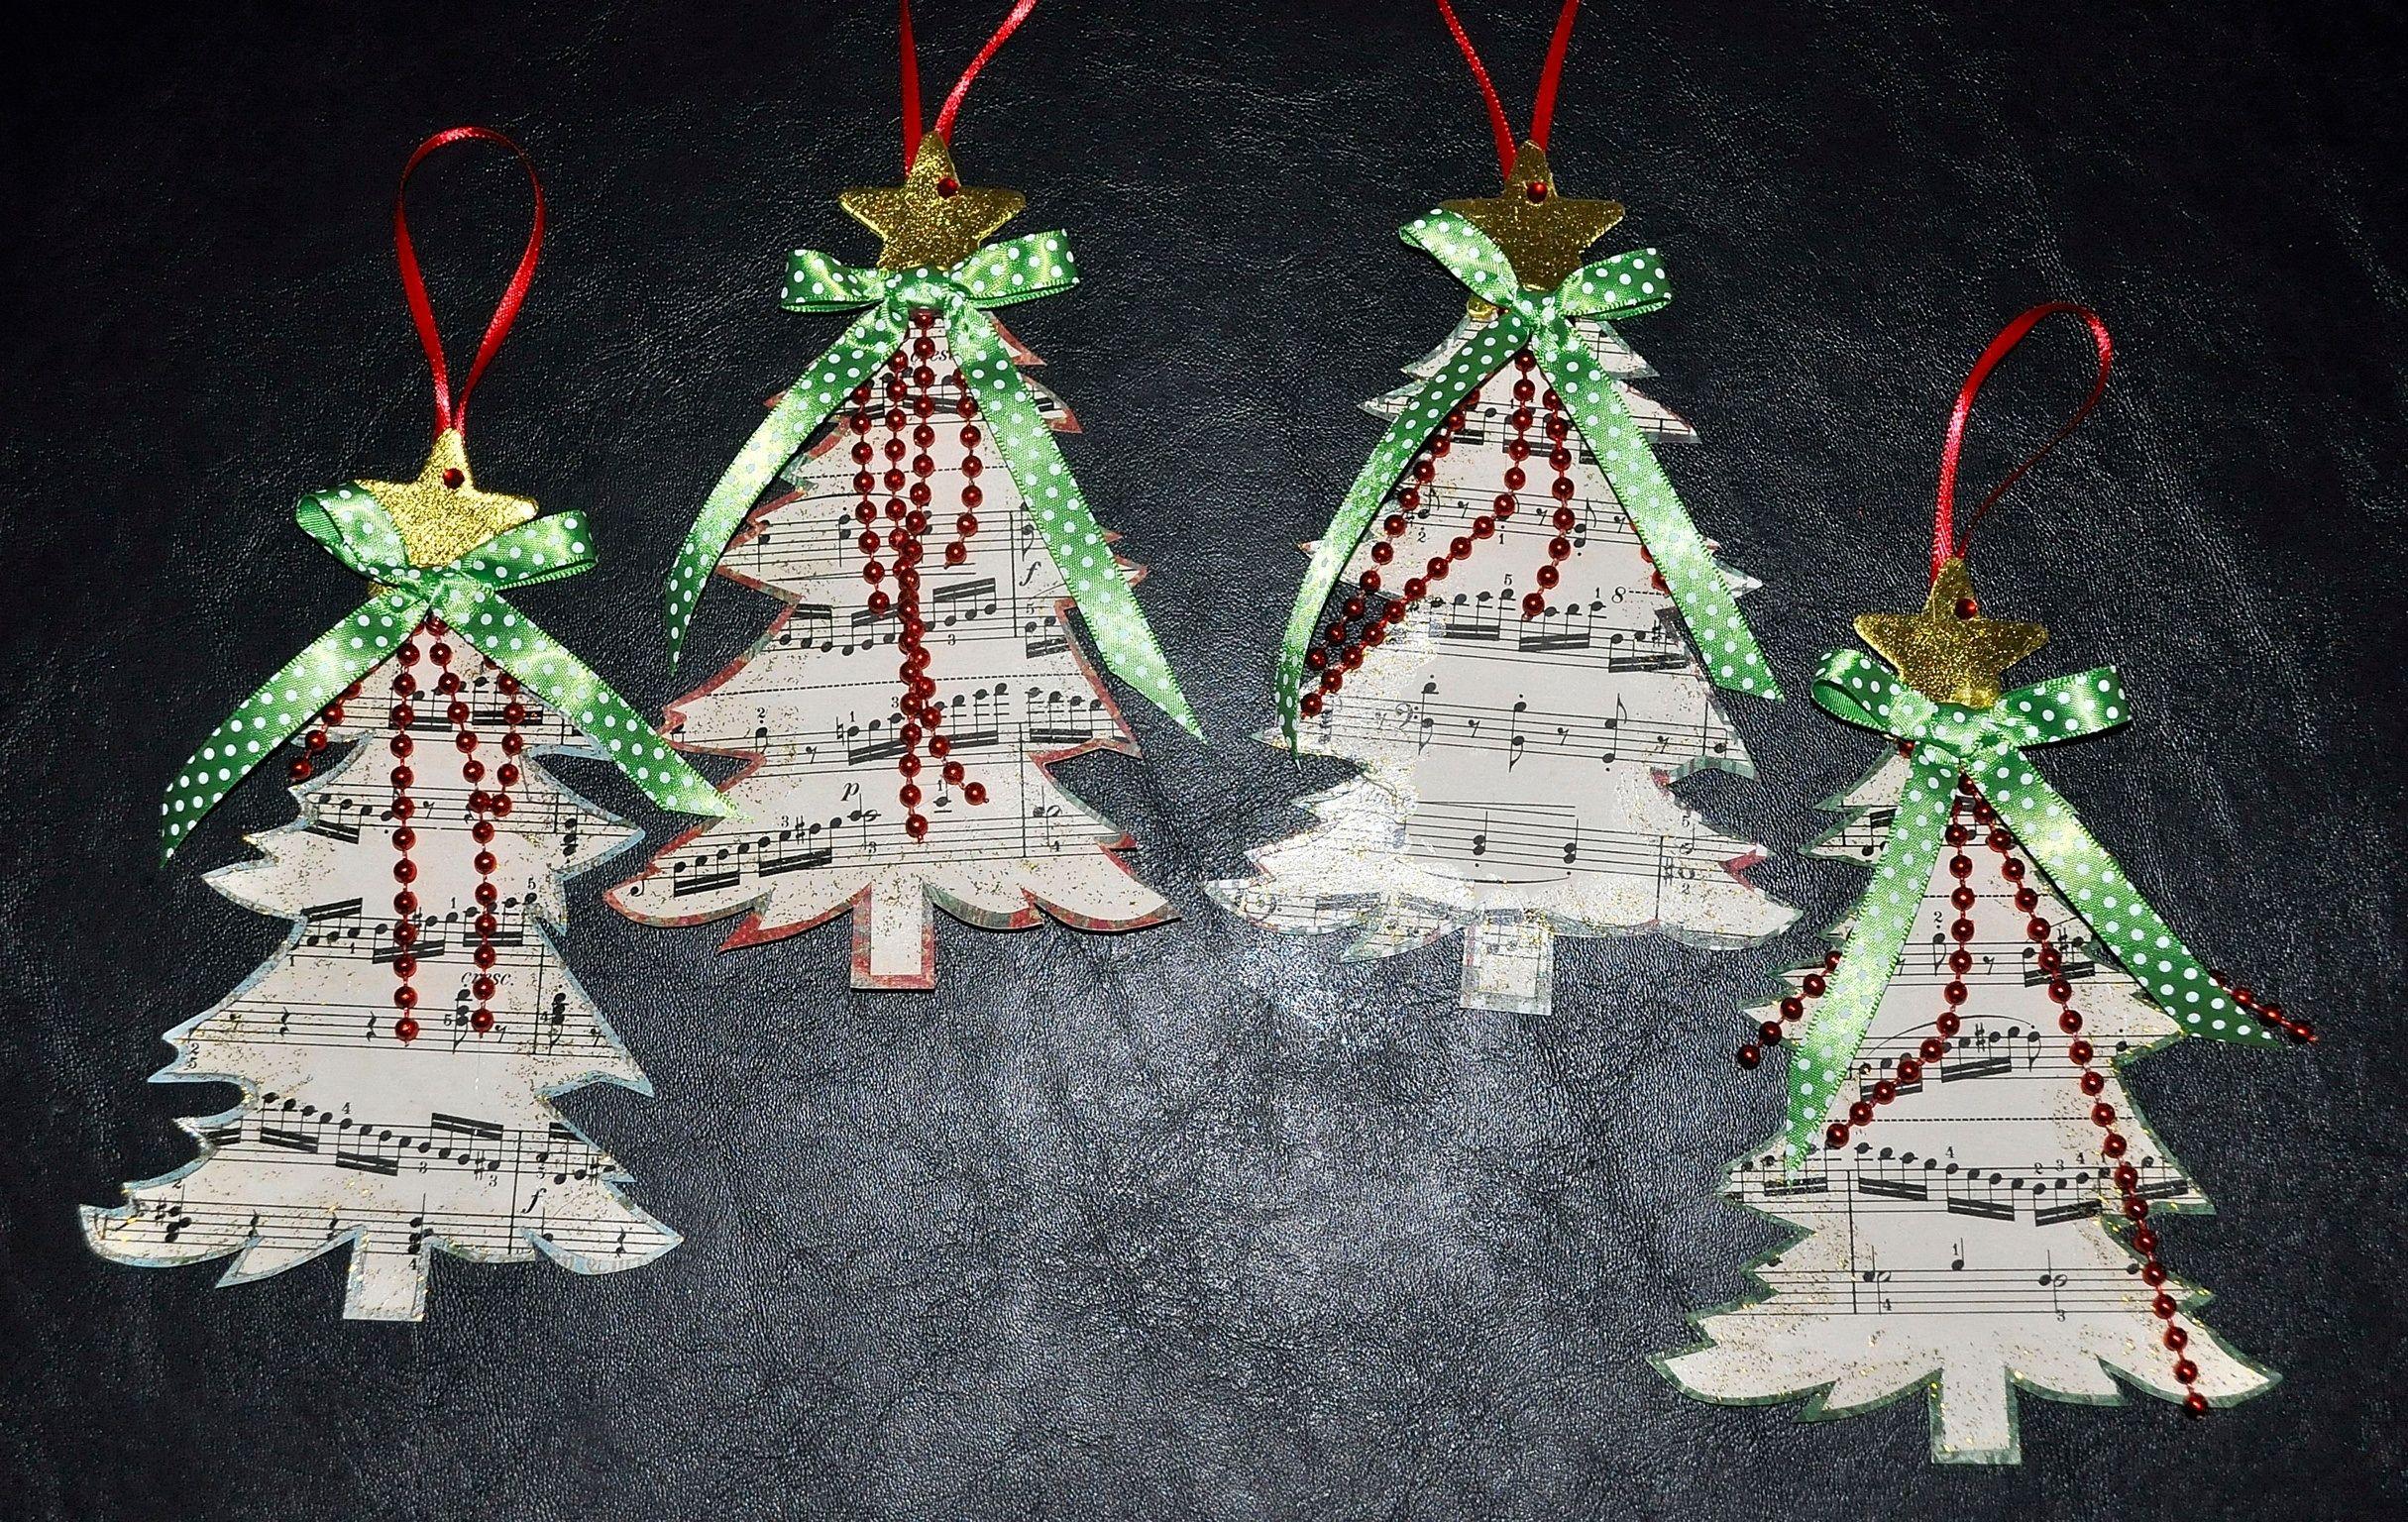 Sheet Music Christmas Tree Ornaments Music Ornaments Christmas Ornaments Creative Christmas